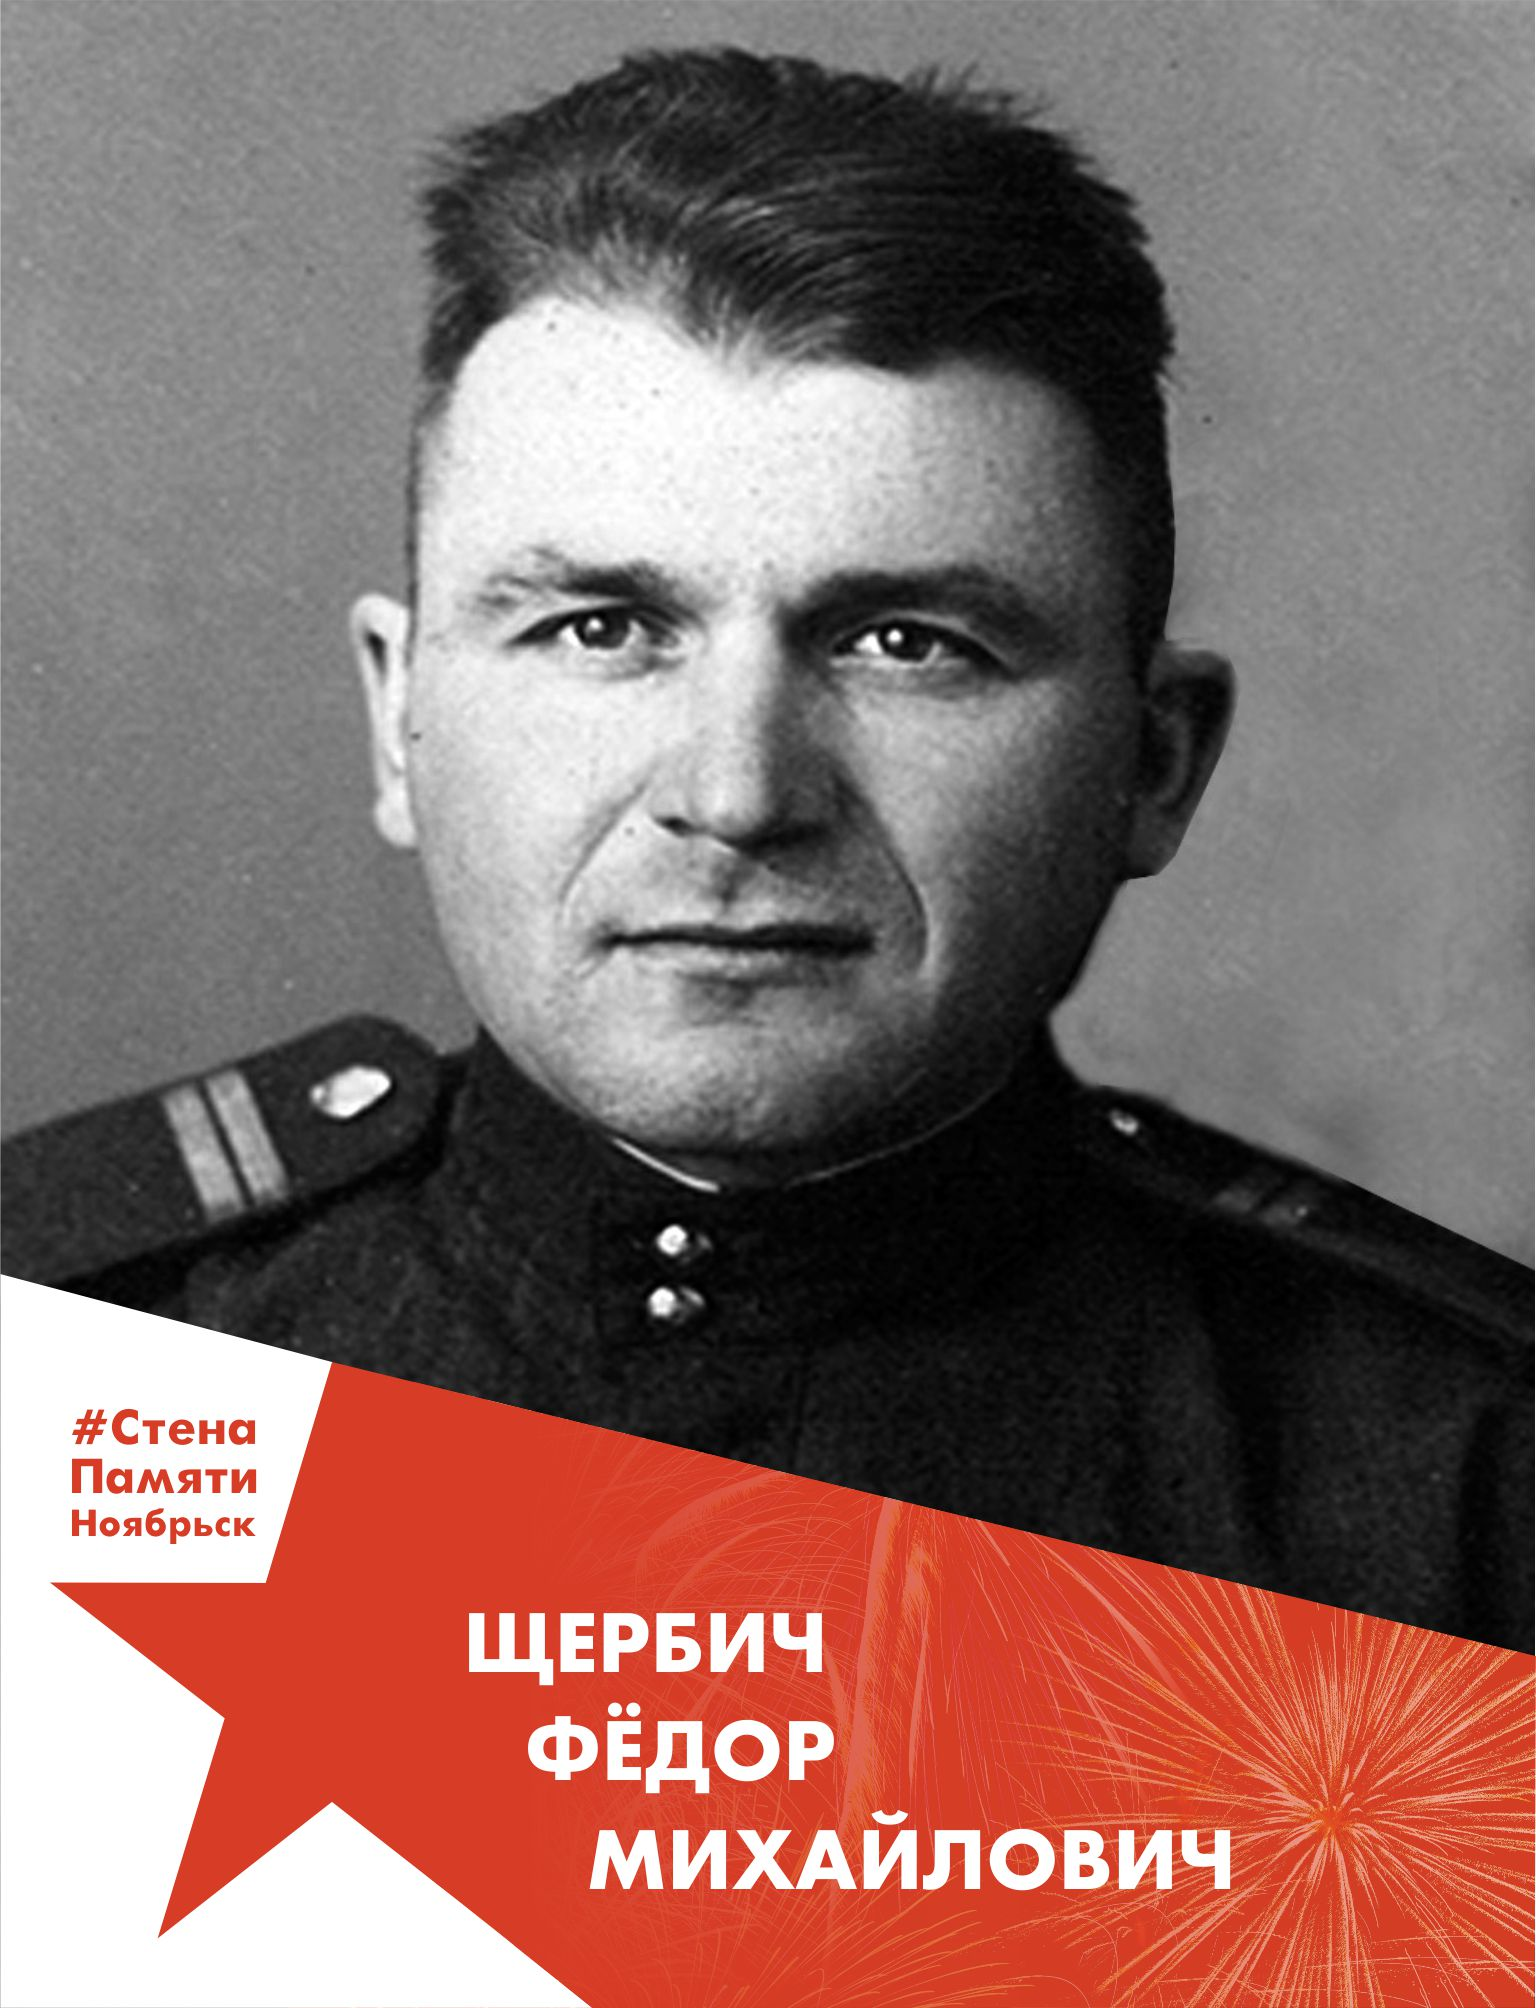 Щербич Фёдор Михайлович